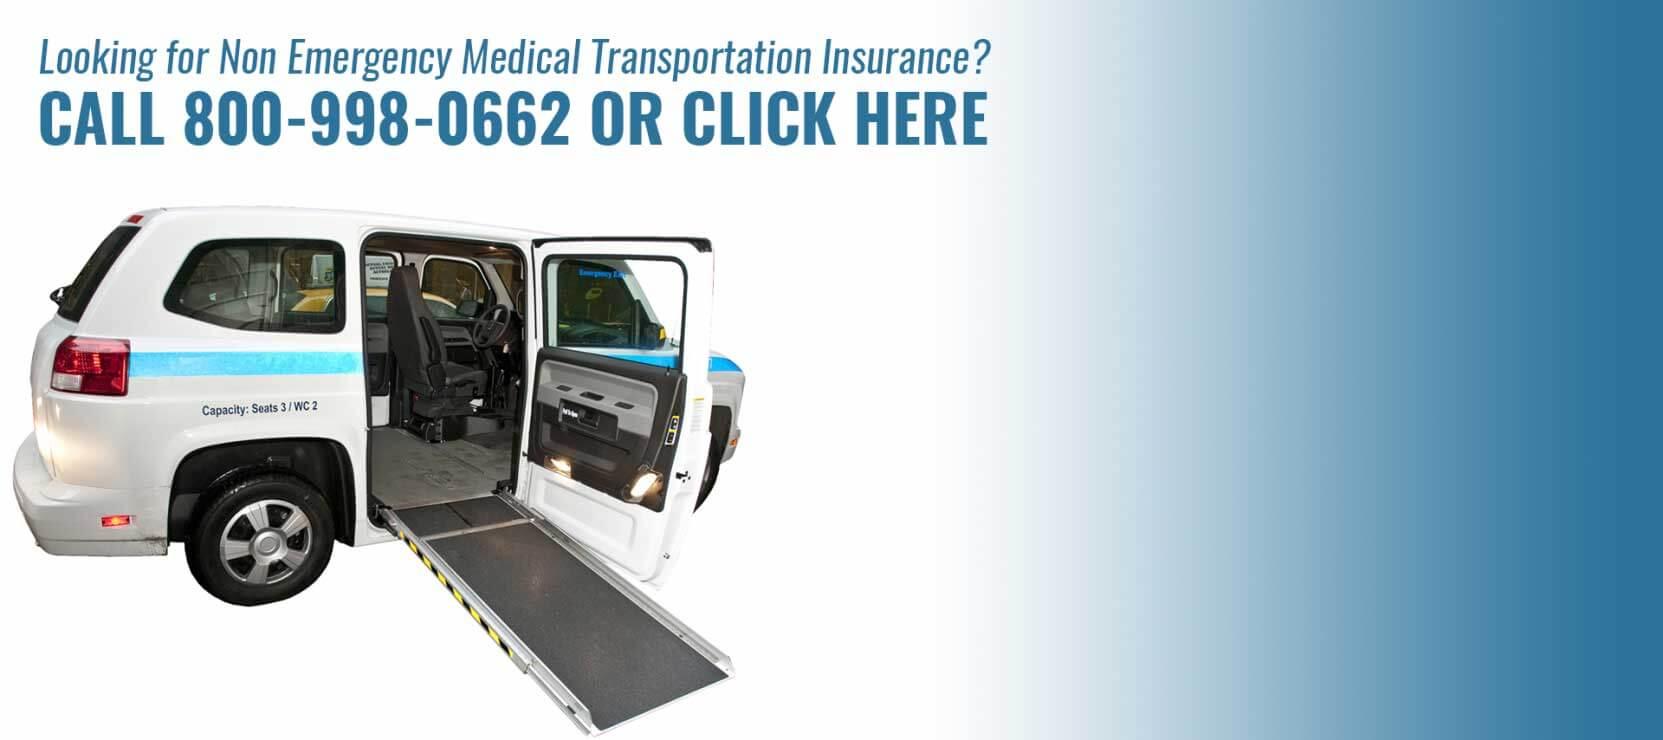 Non-emergency-medical-transportation-pathway-slider01-1663x740_c